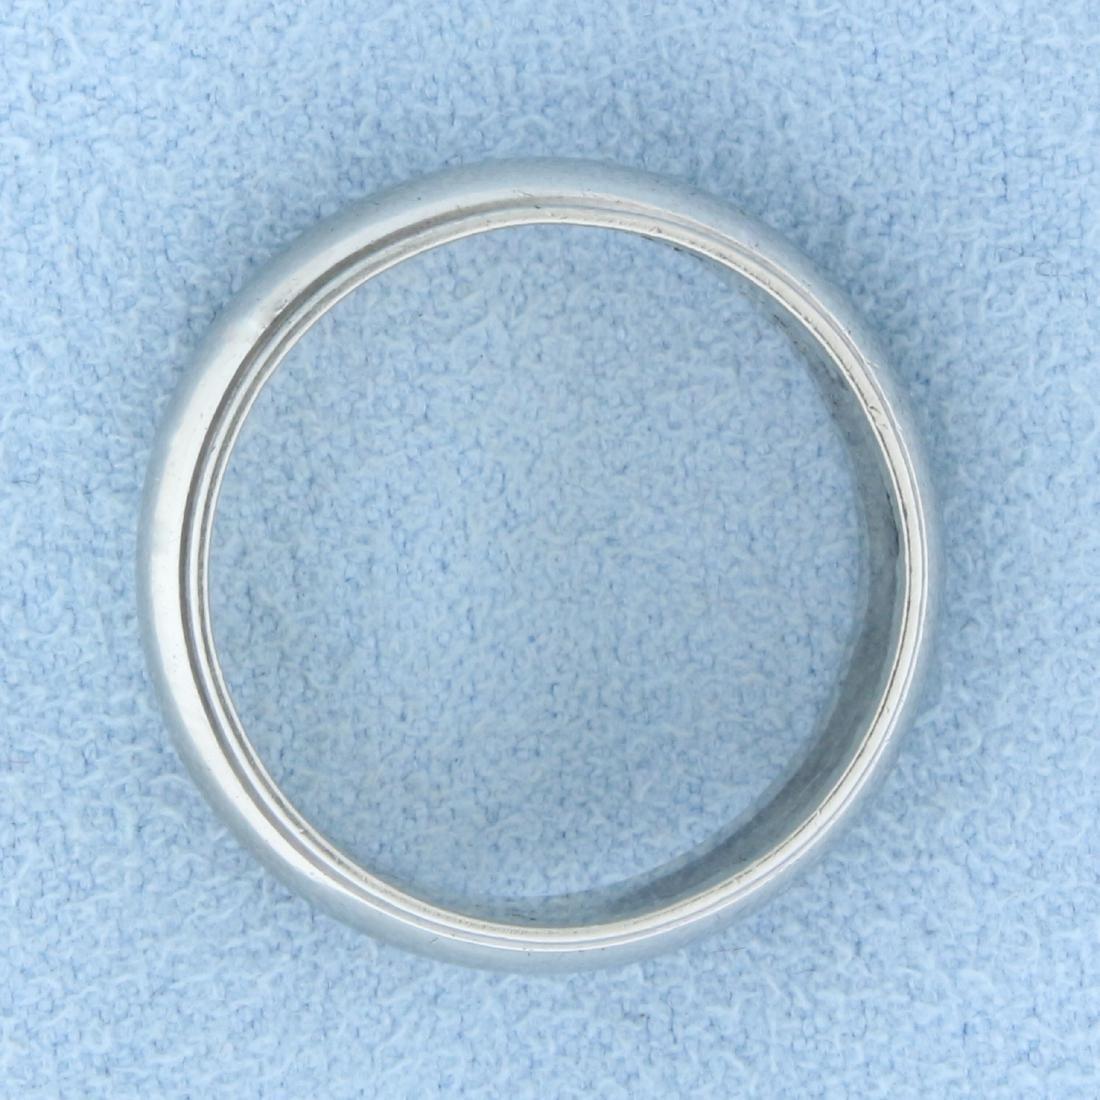 Beaded Edge Wedding Band Ring in 14K White Gold - 2